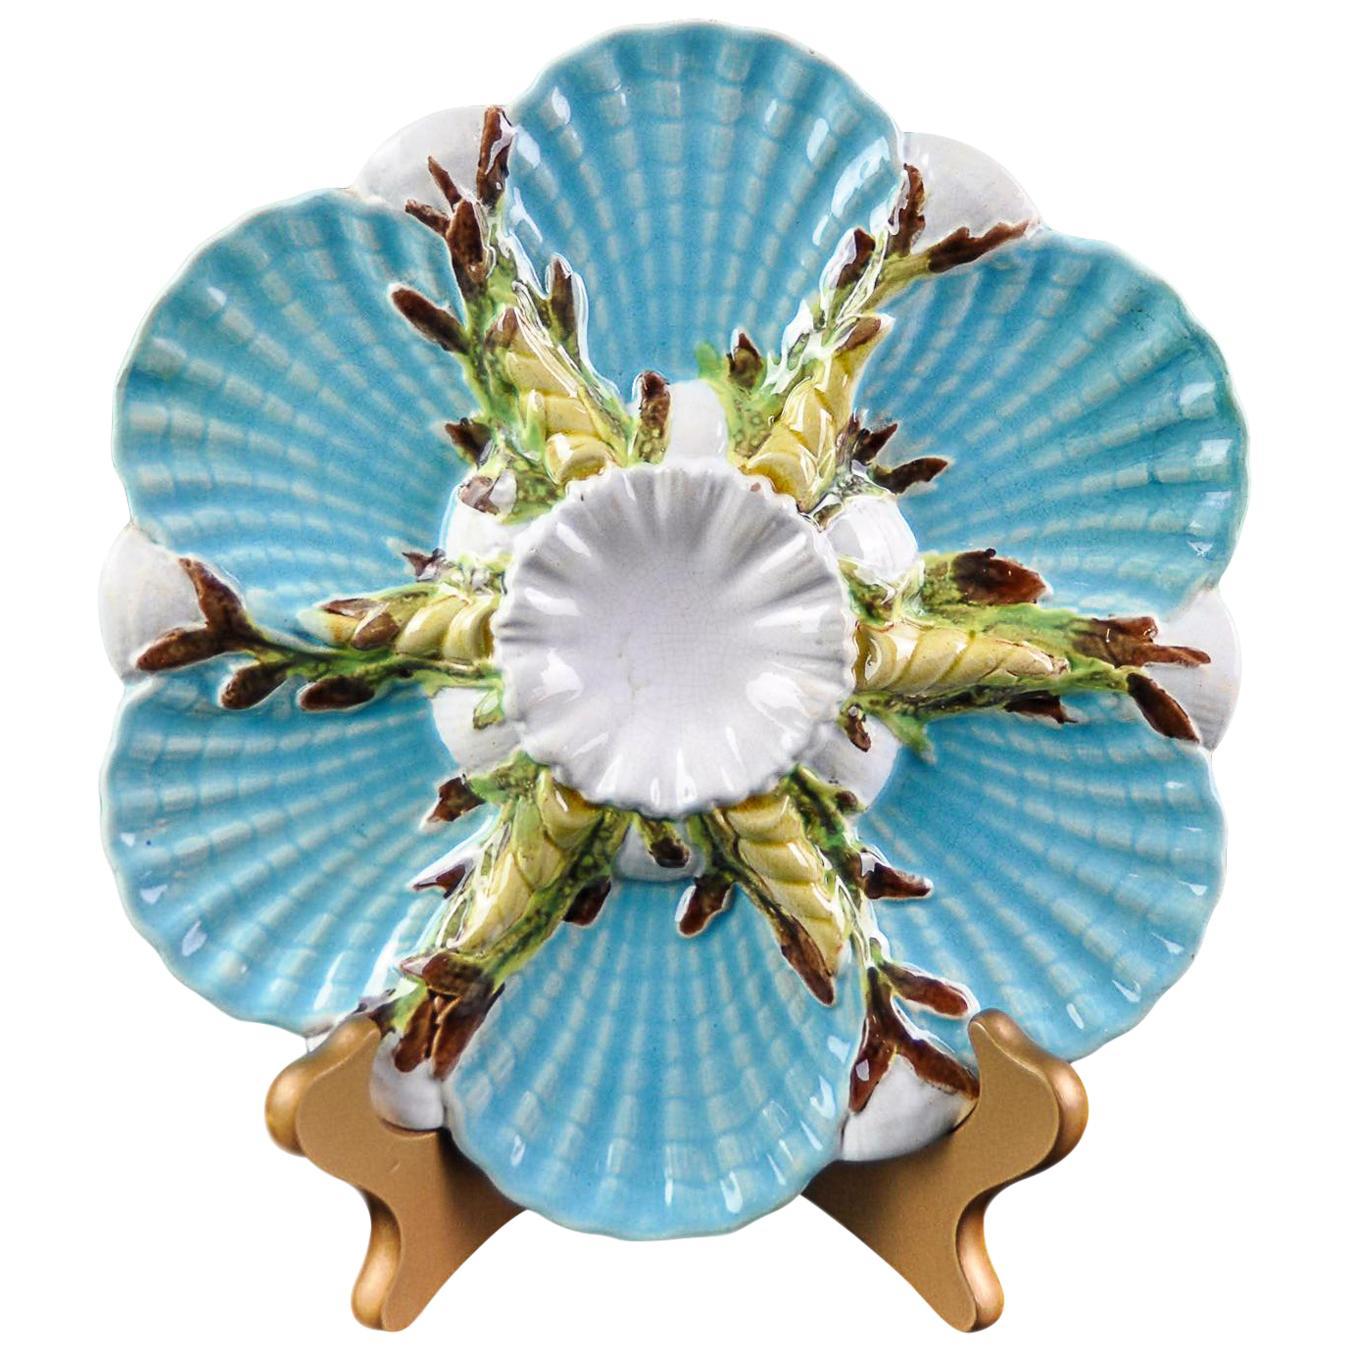 George Jones Majolica Turquoise Oyster Plate, English, circa 1875